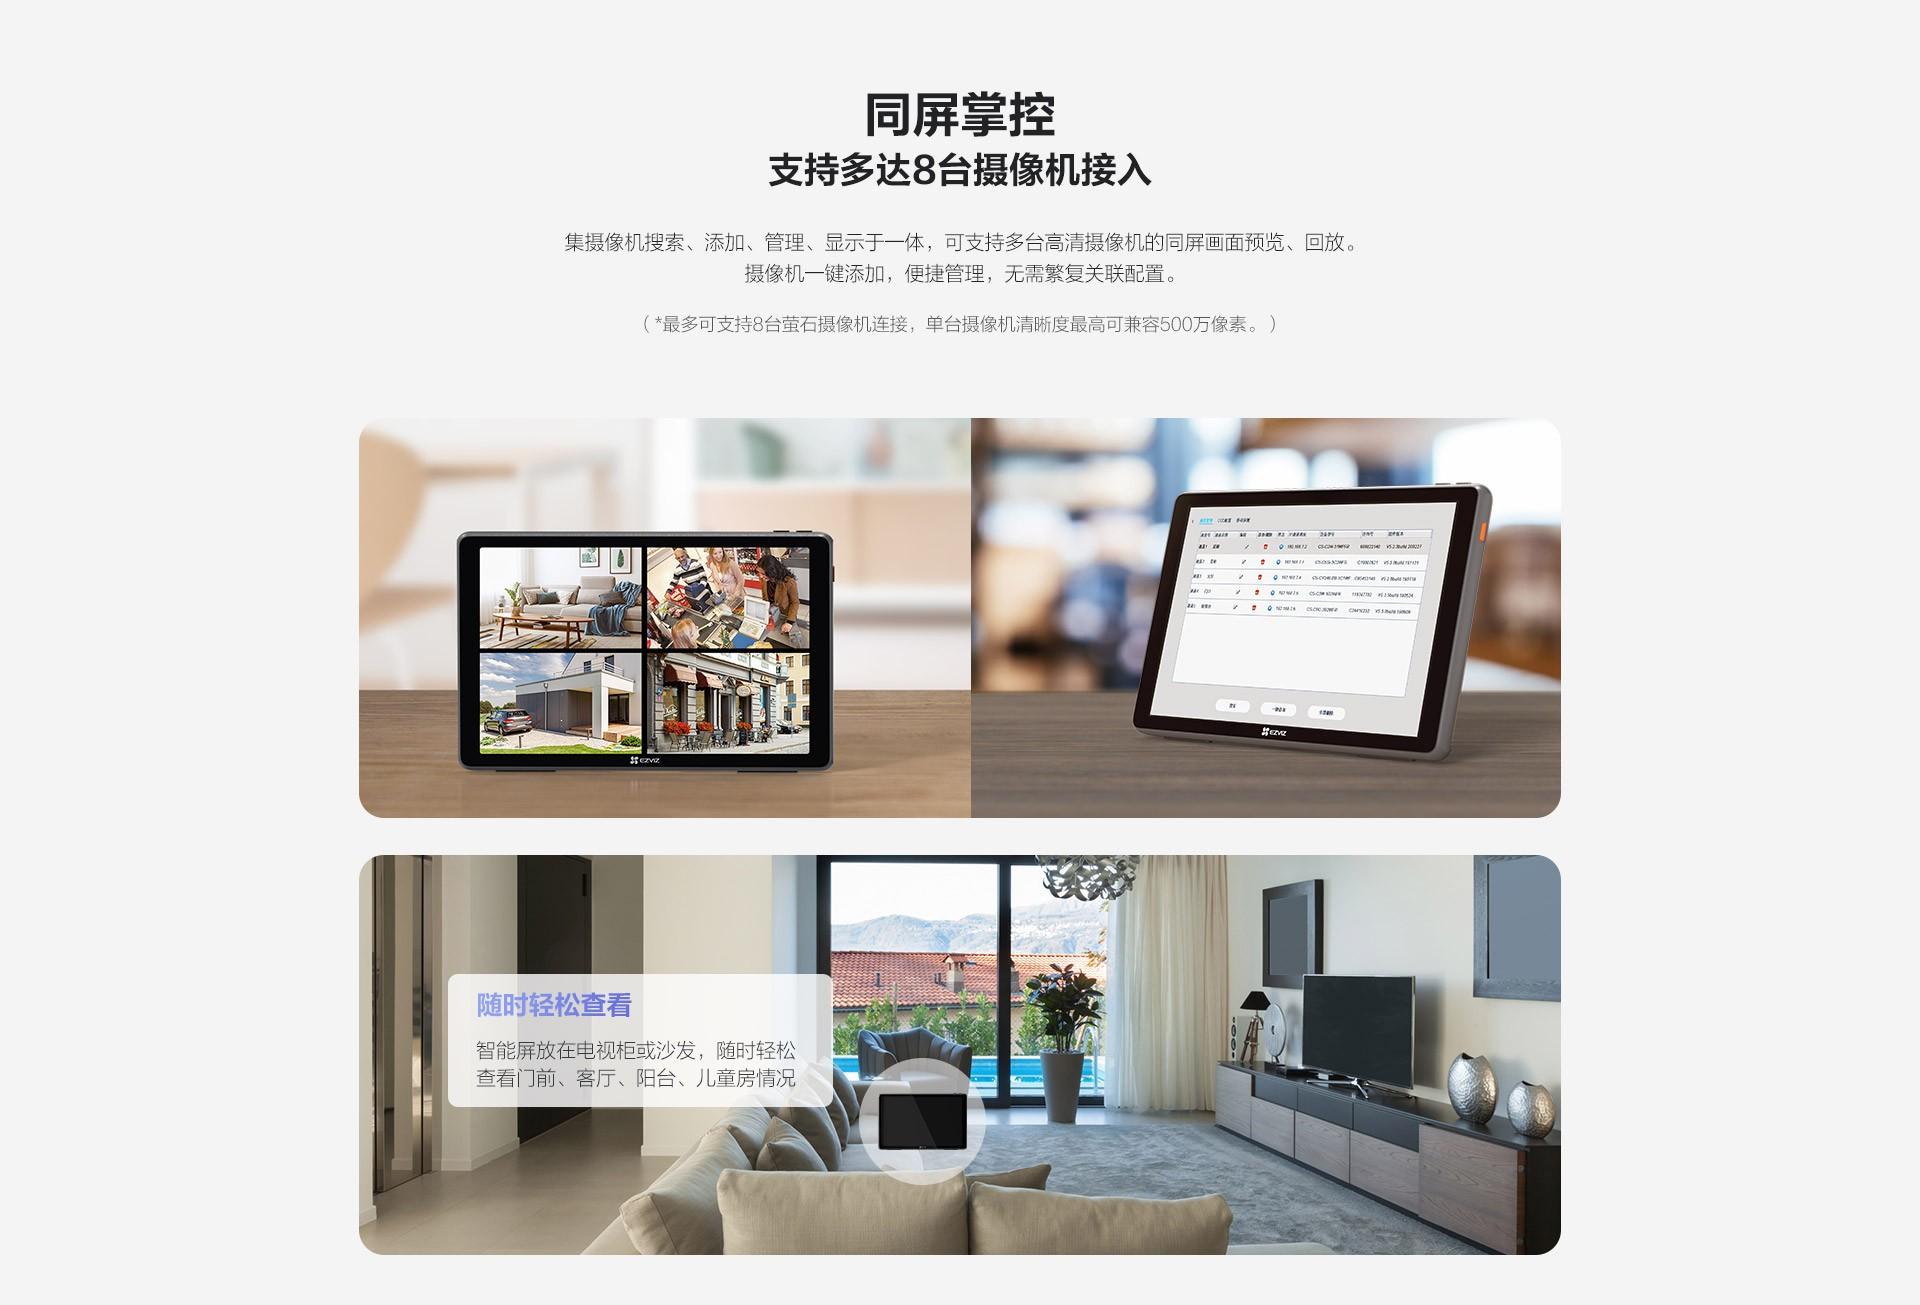 SD1-web_05.jpg